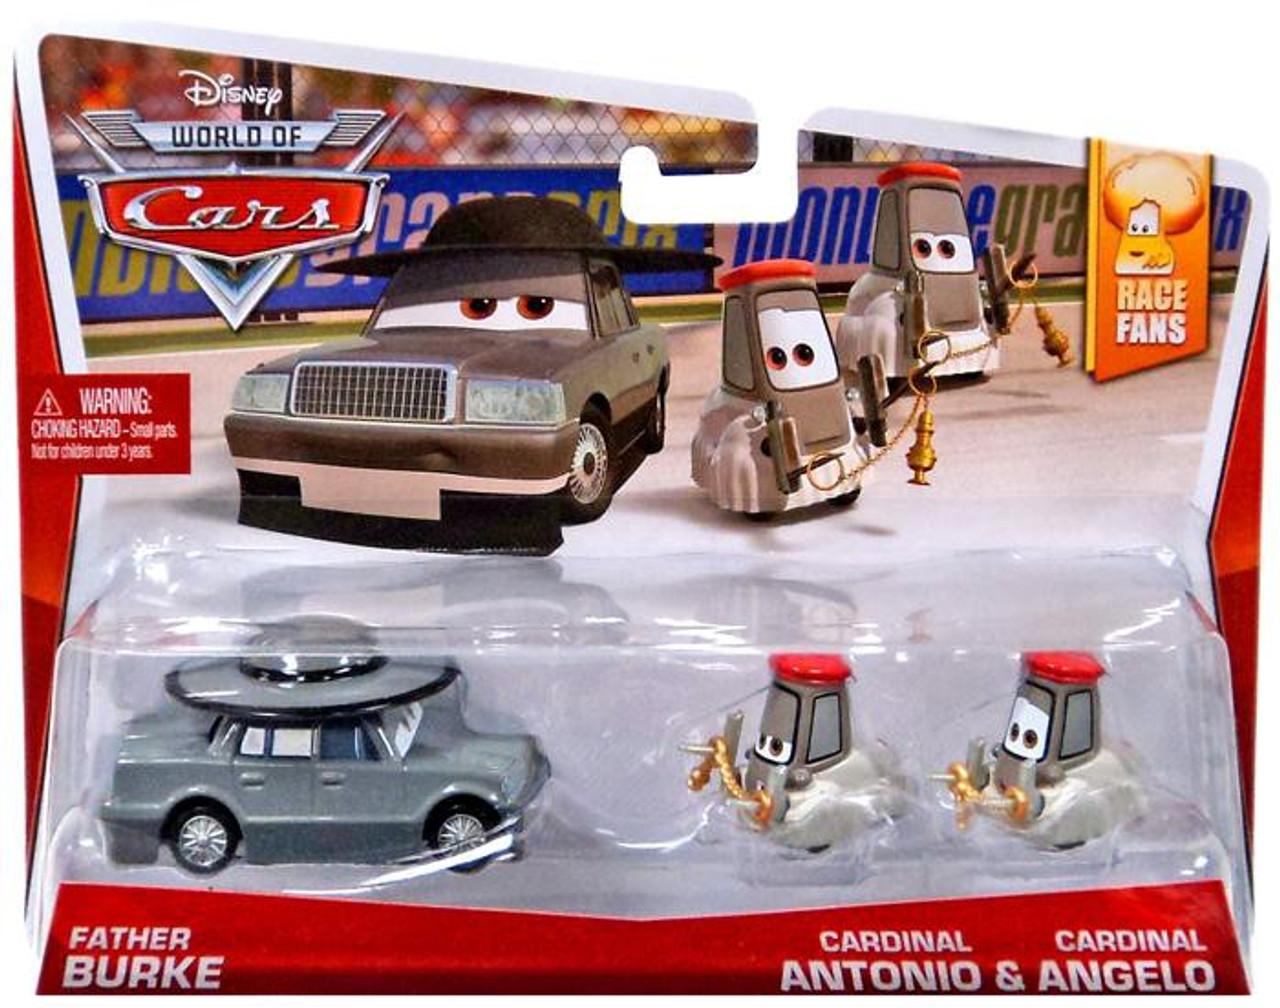 Disney Cars The World of Cars Father Burke, Cardinal Antonio & Angelo Diecast Car 3-Pack #2/9, 3/9 & 4/9